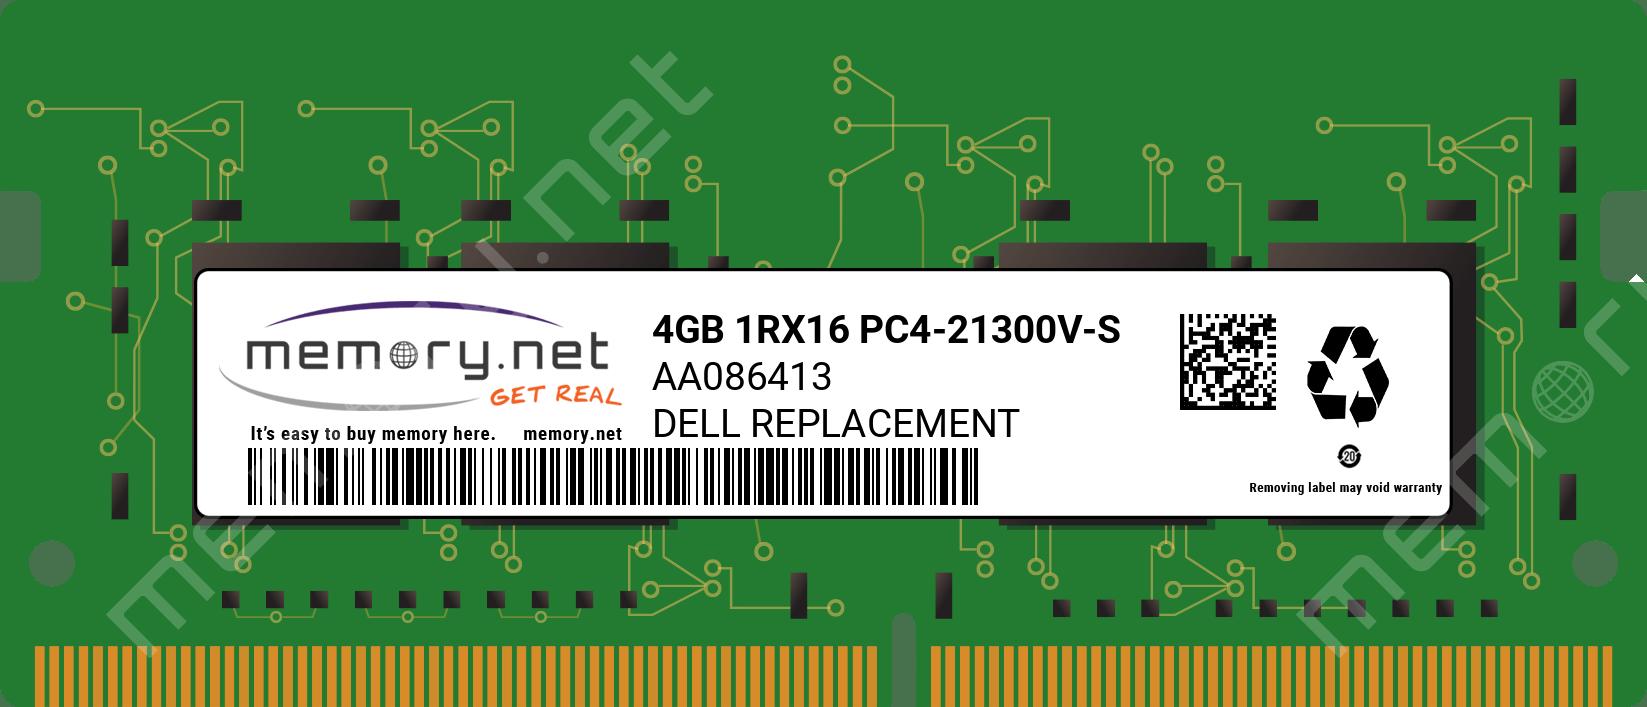 AA086413